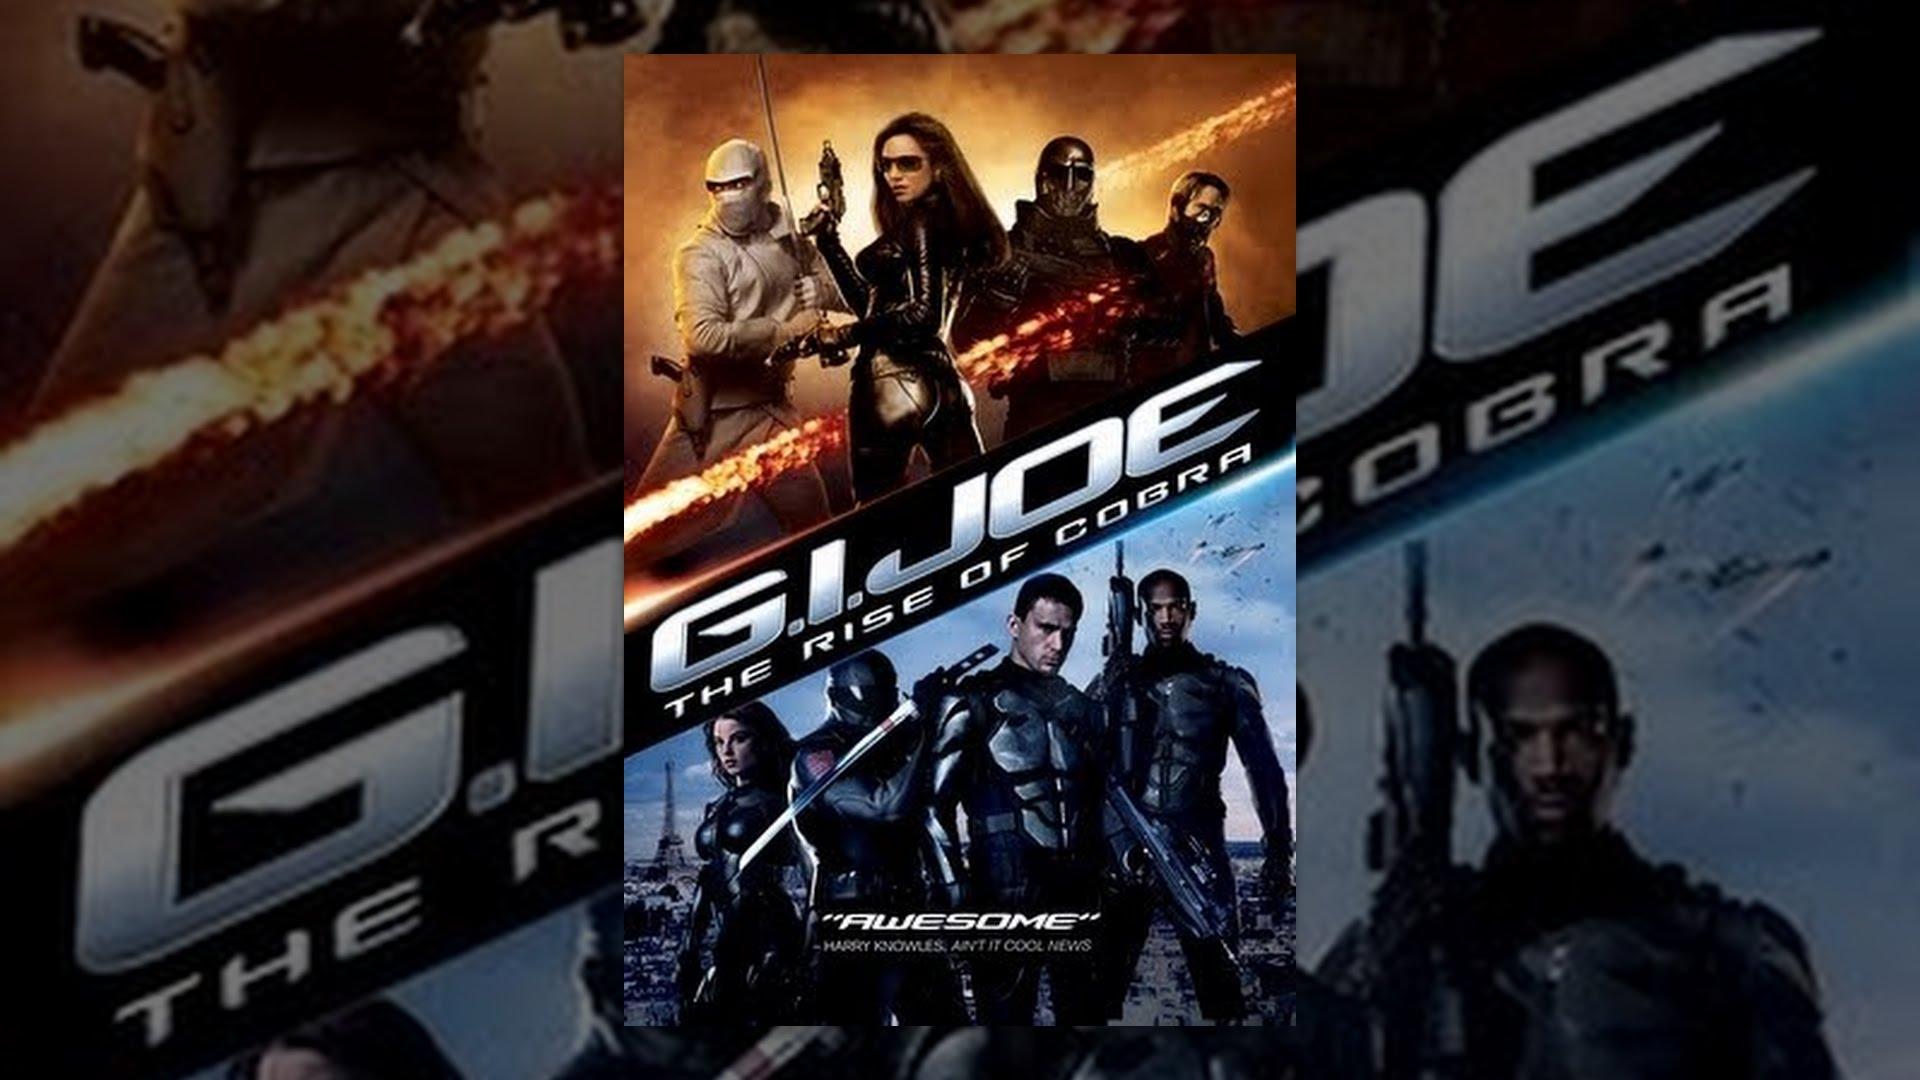 Download G.I. Joe: The Rise of Cobra